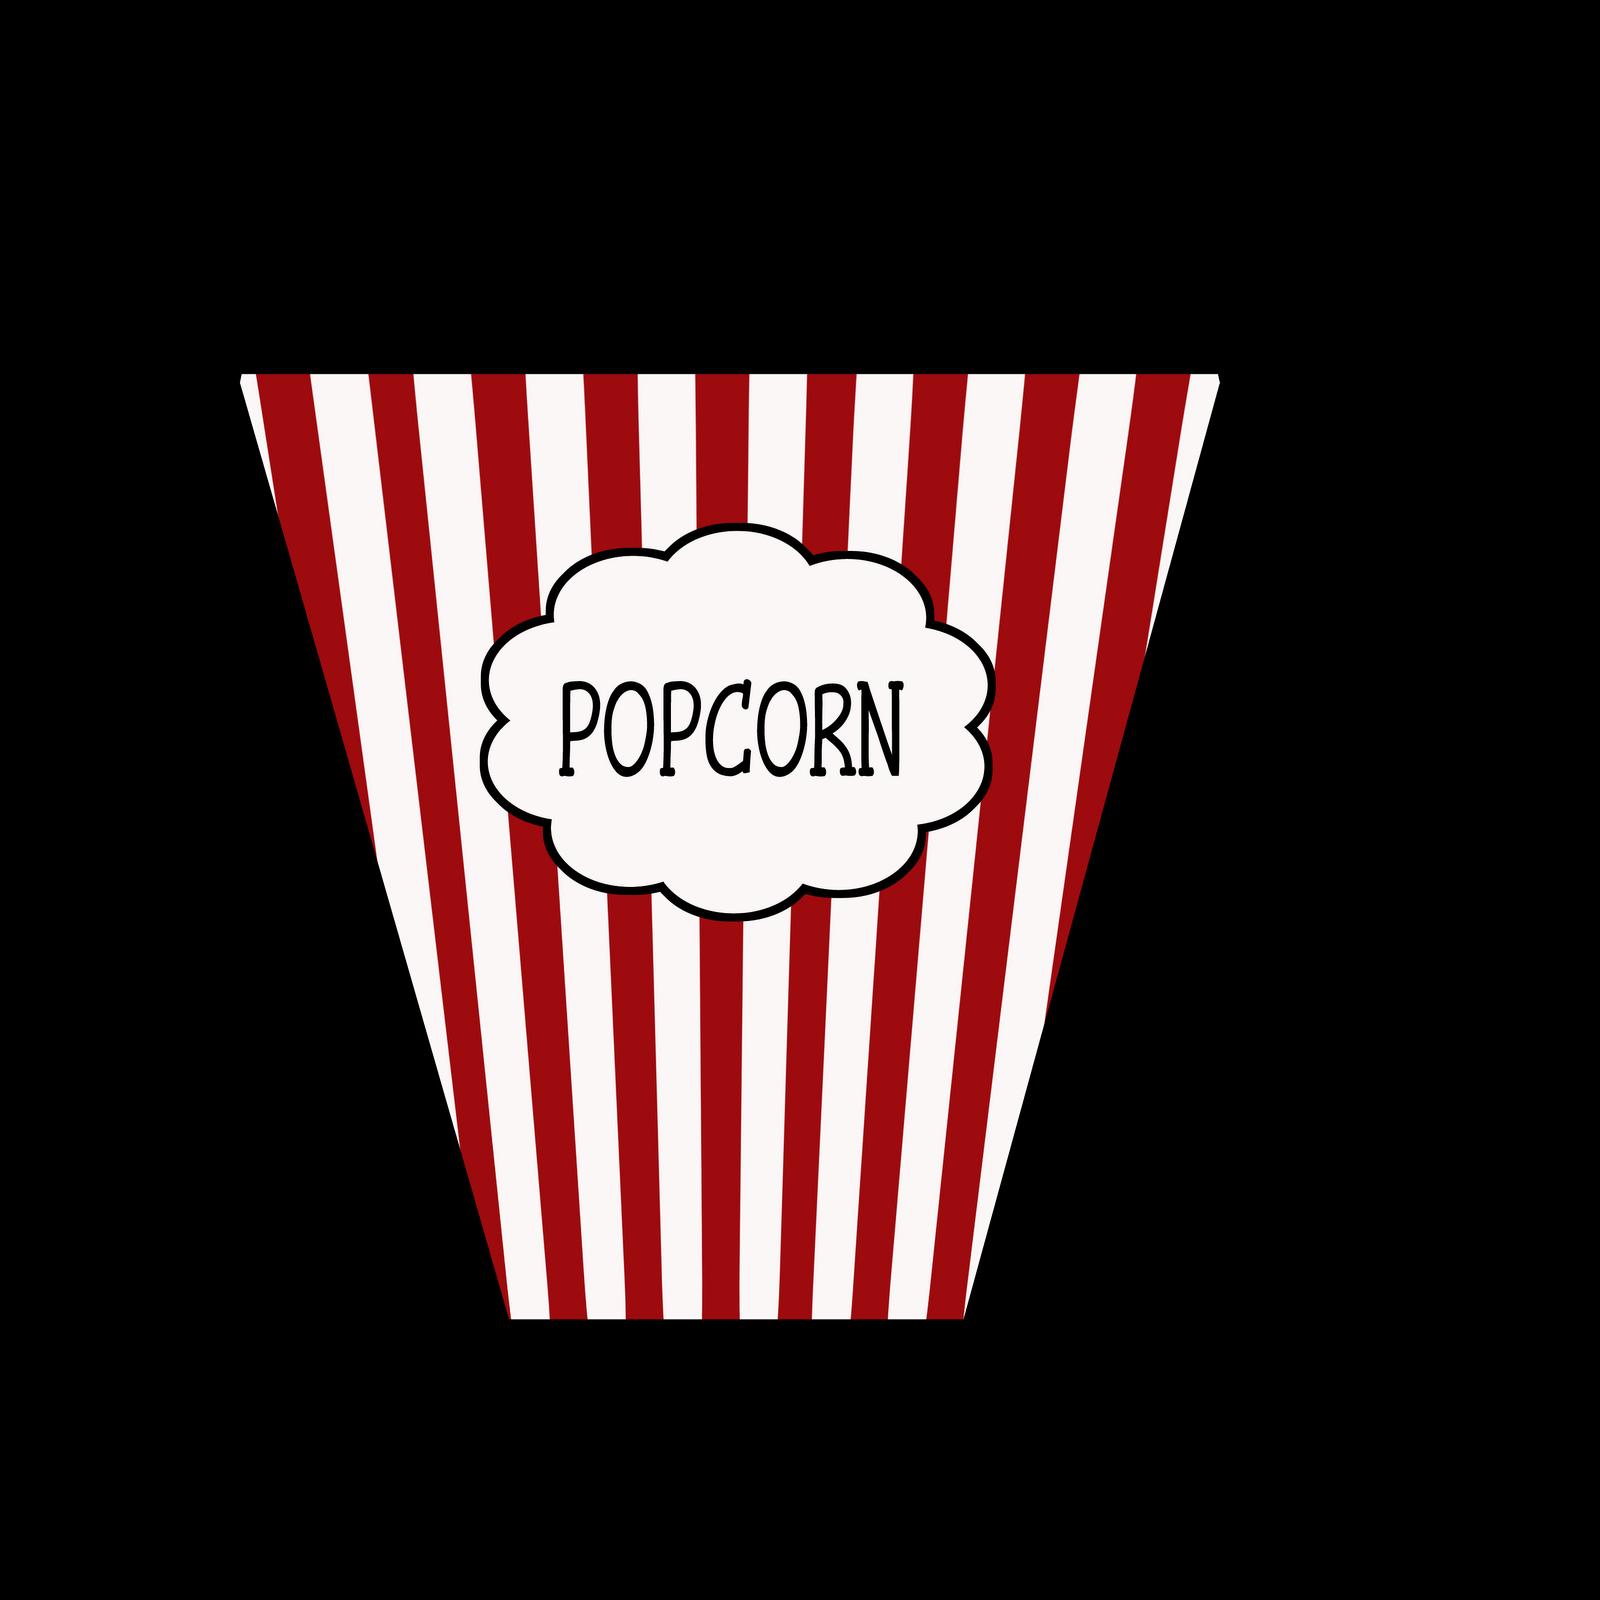 Label clipart popcorn, Label popcorn Transparent FREE for.